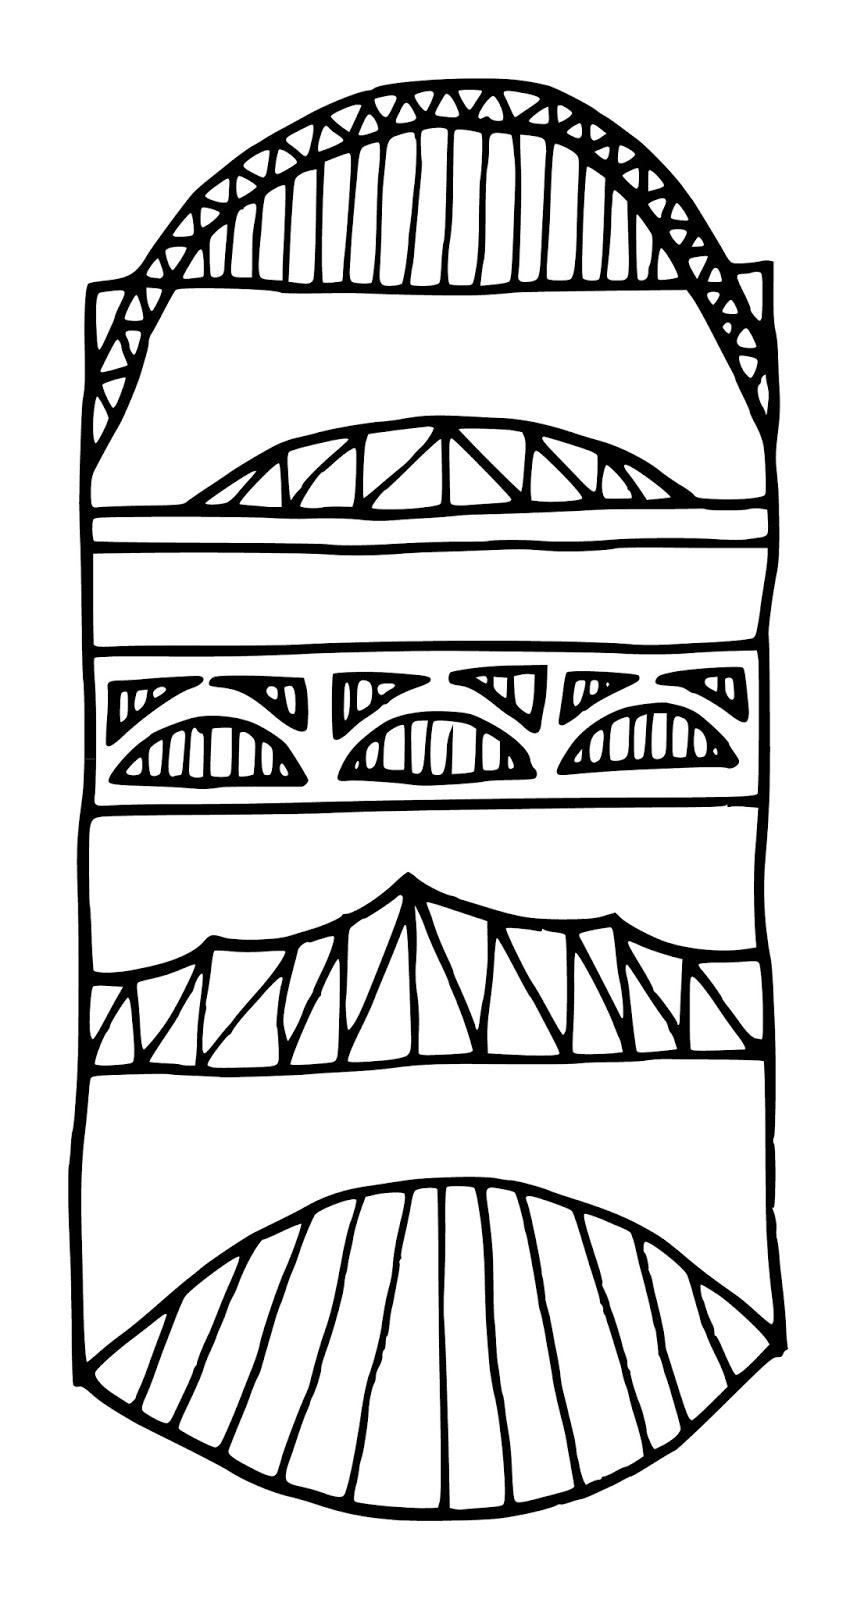 857x1600 Laurie Woodruff Illustration Bridges